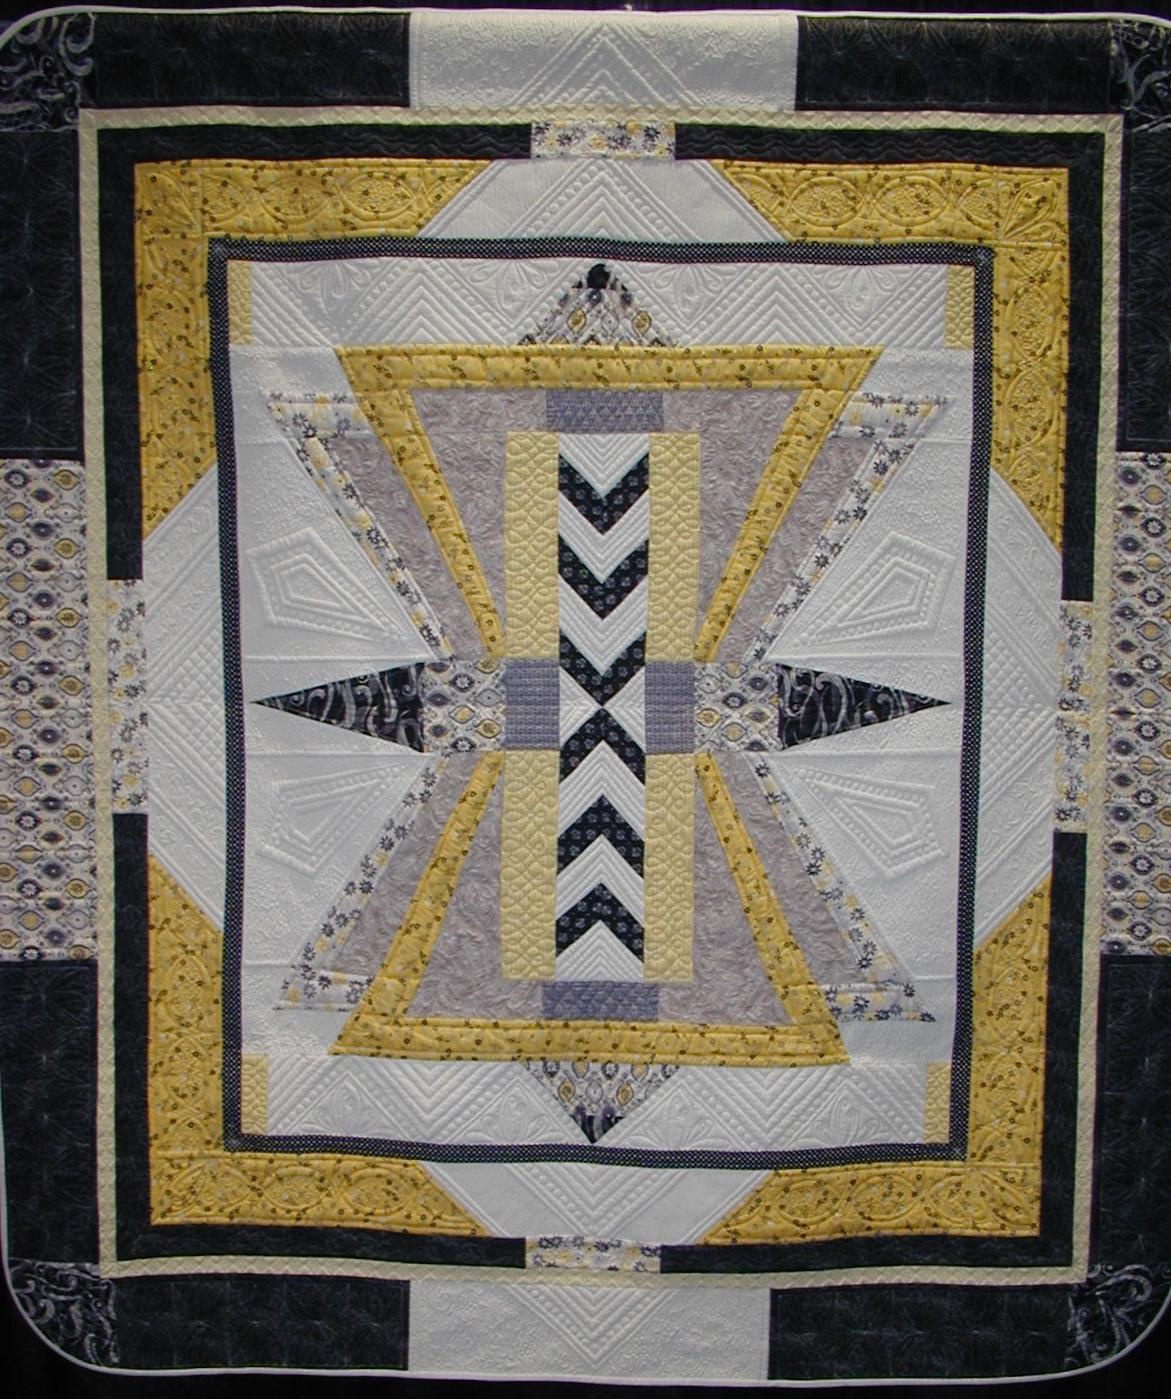 Moonbear Longarm Quilting Piqf 2015 International Quilts